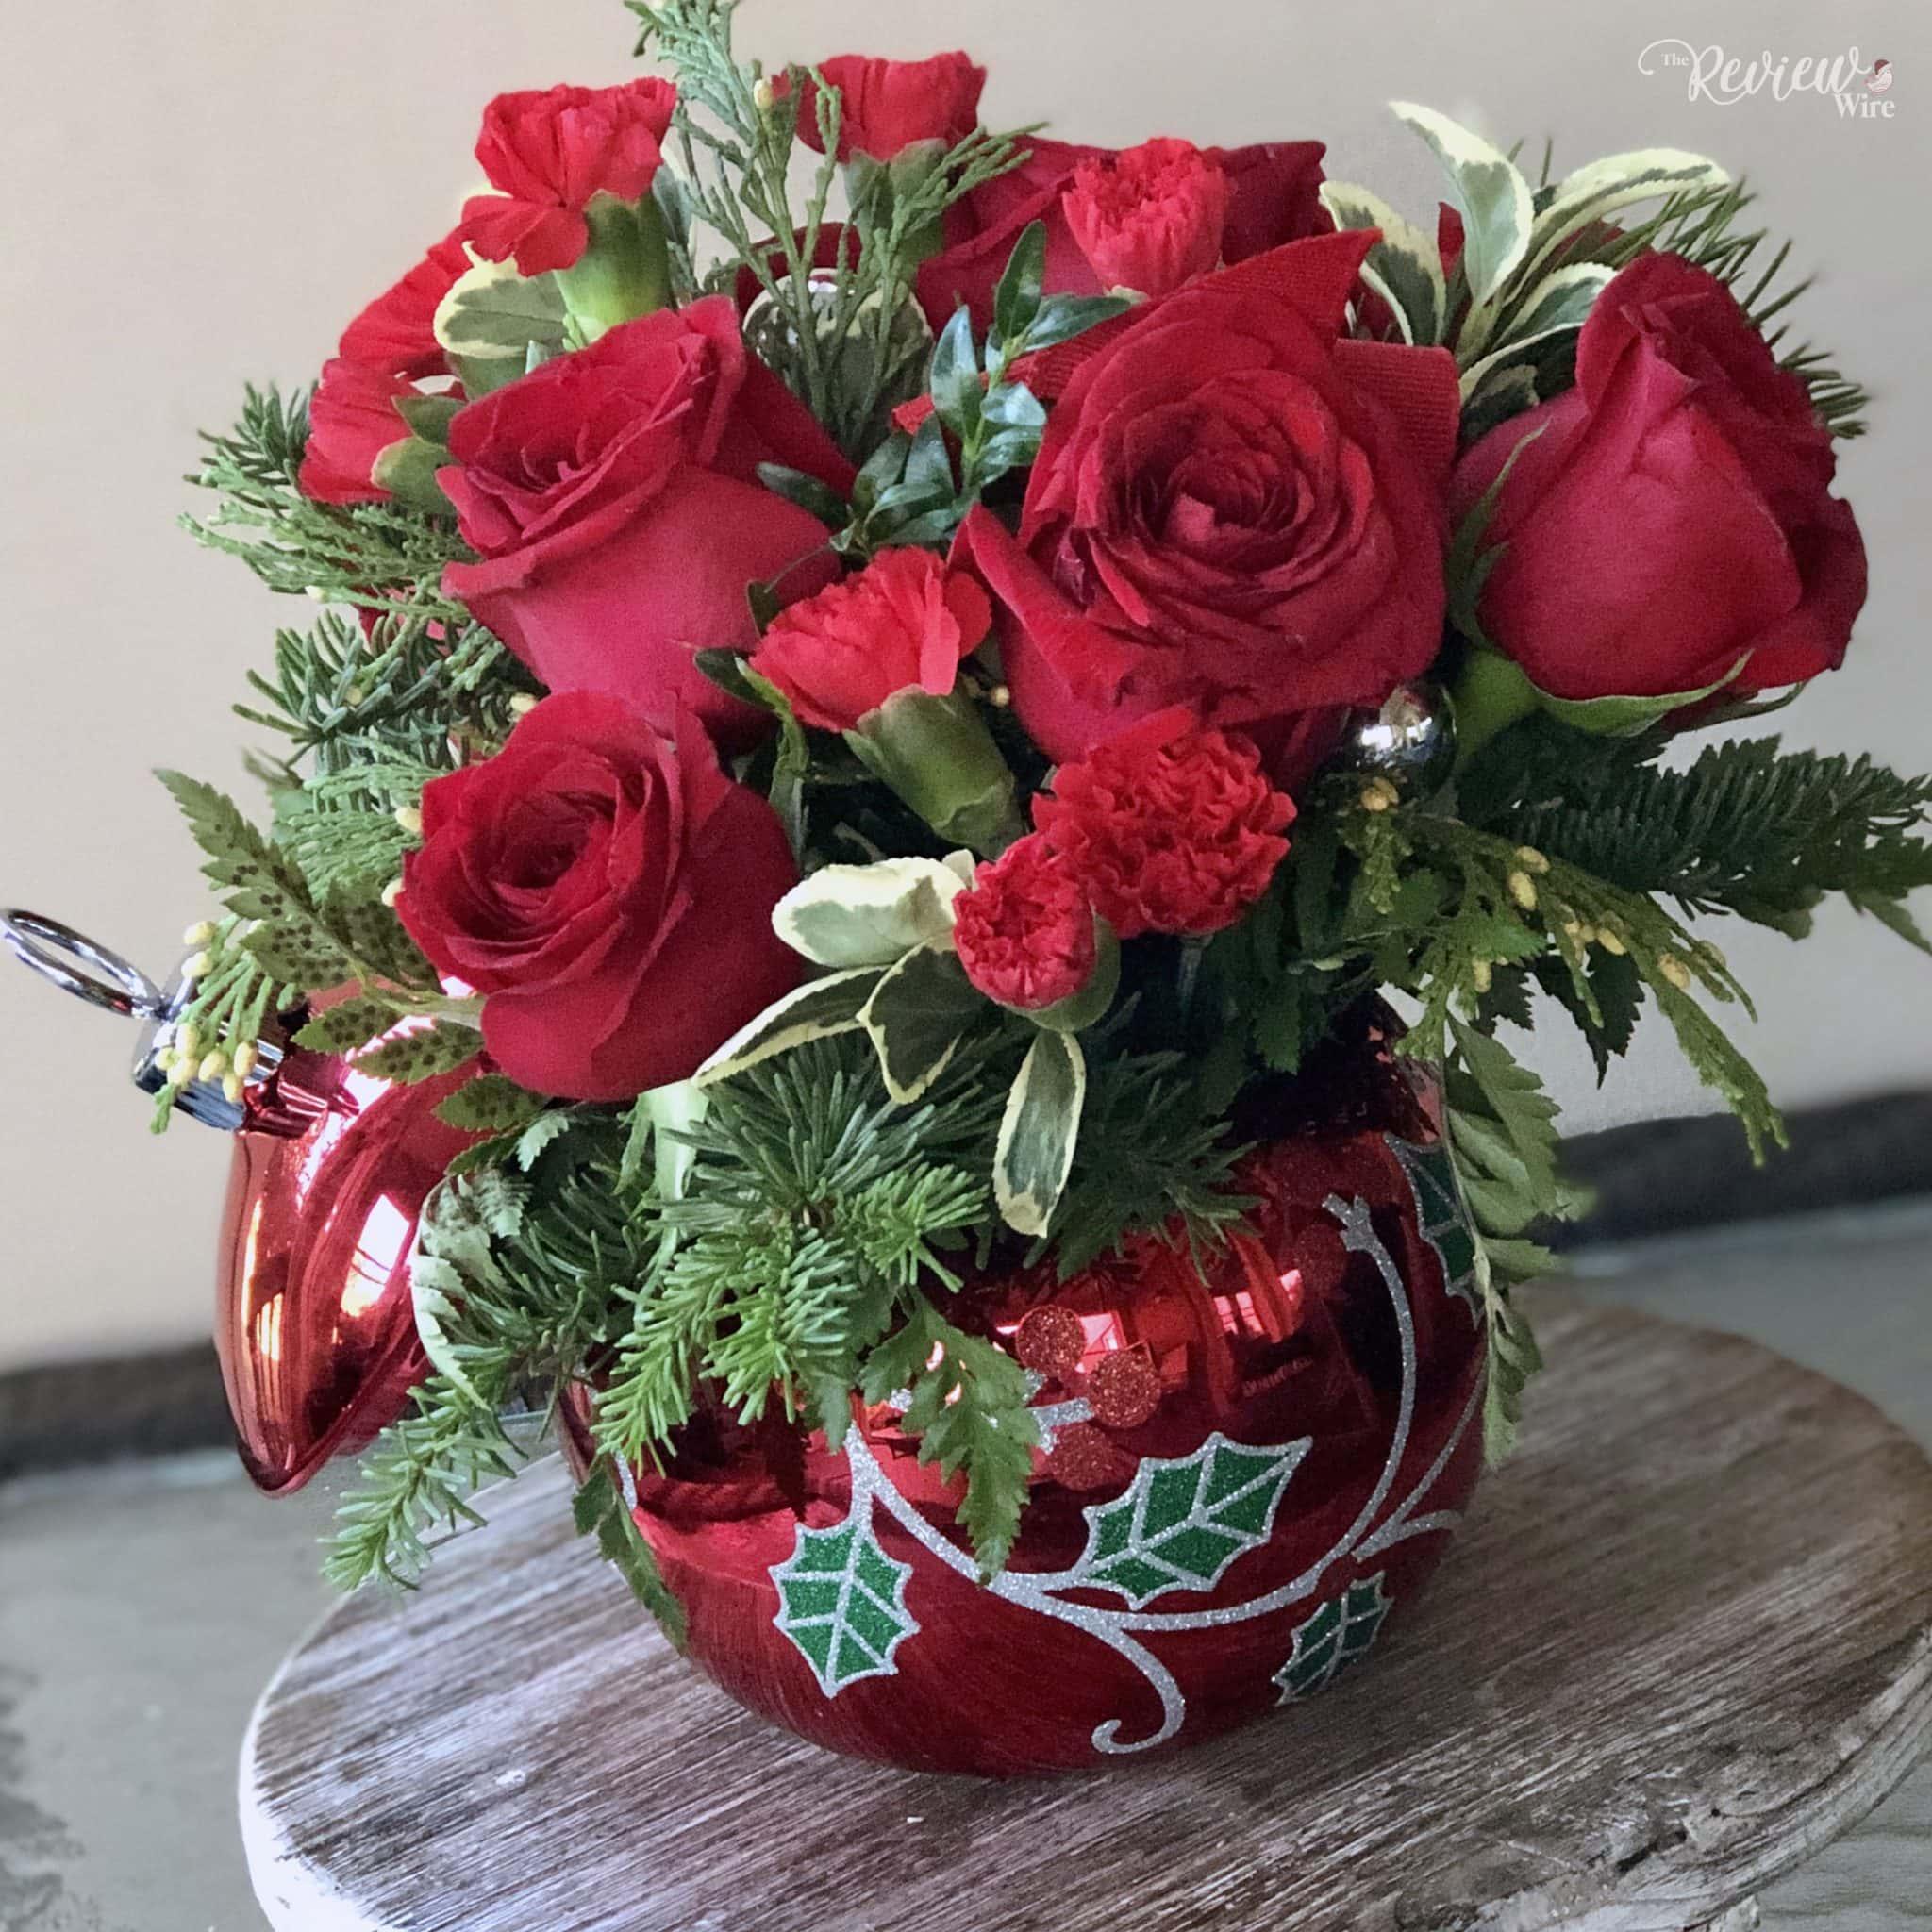 Teleflora's Deck the Holly Ornament Bouquet